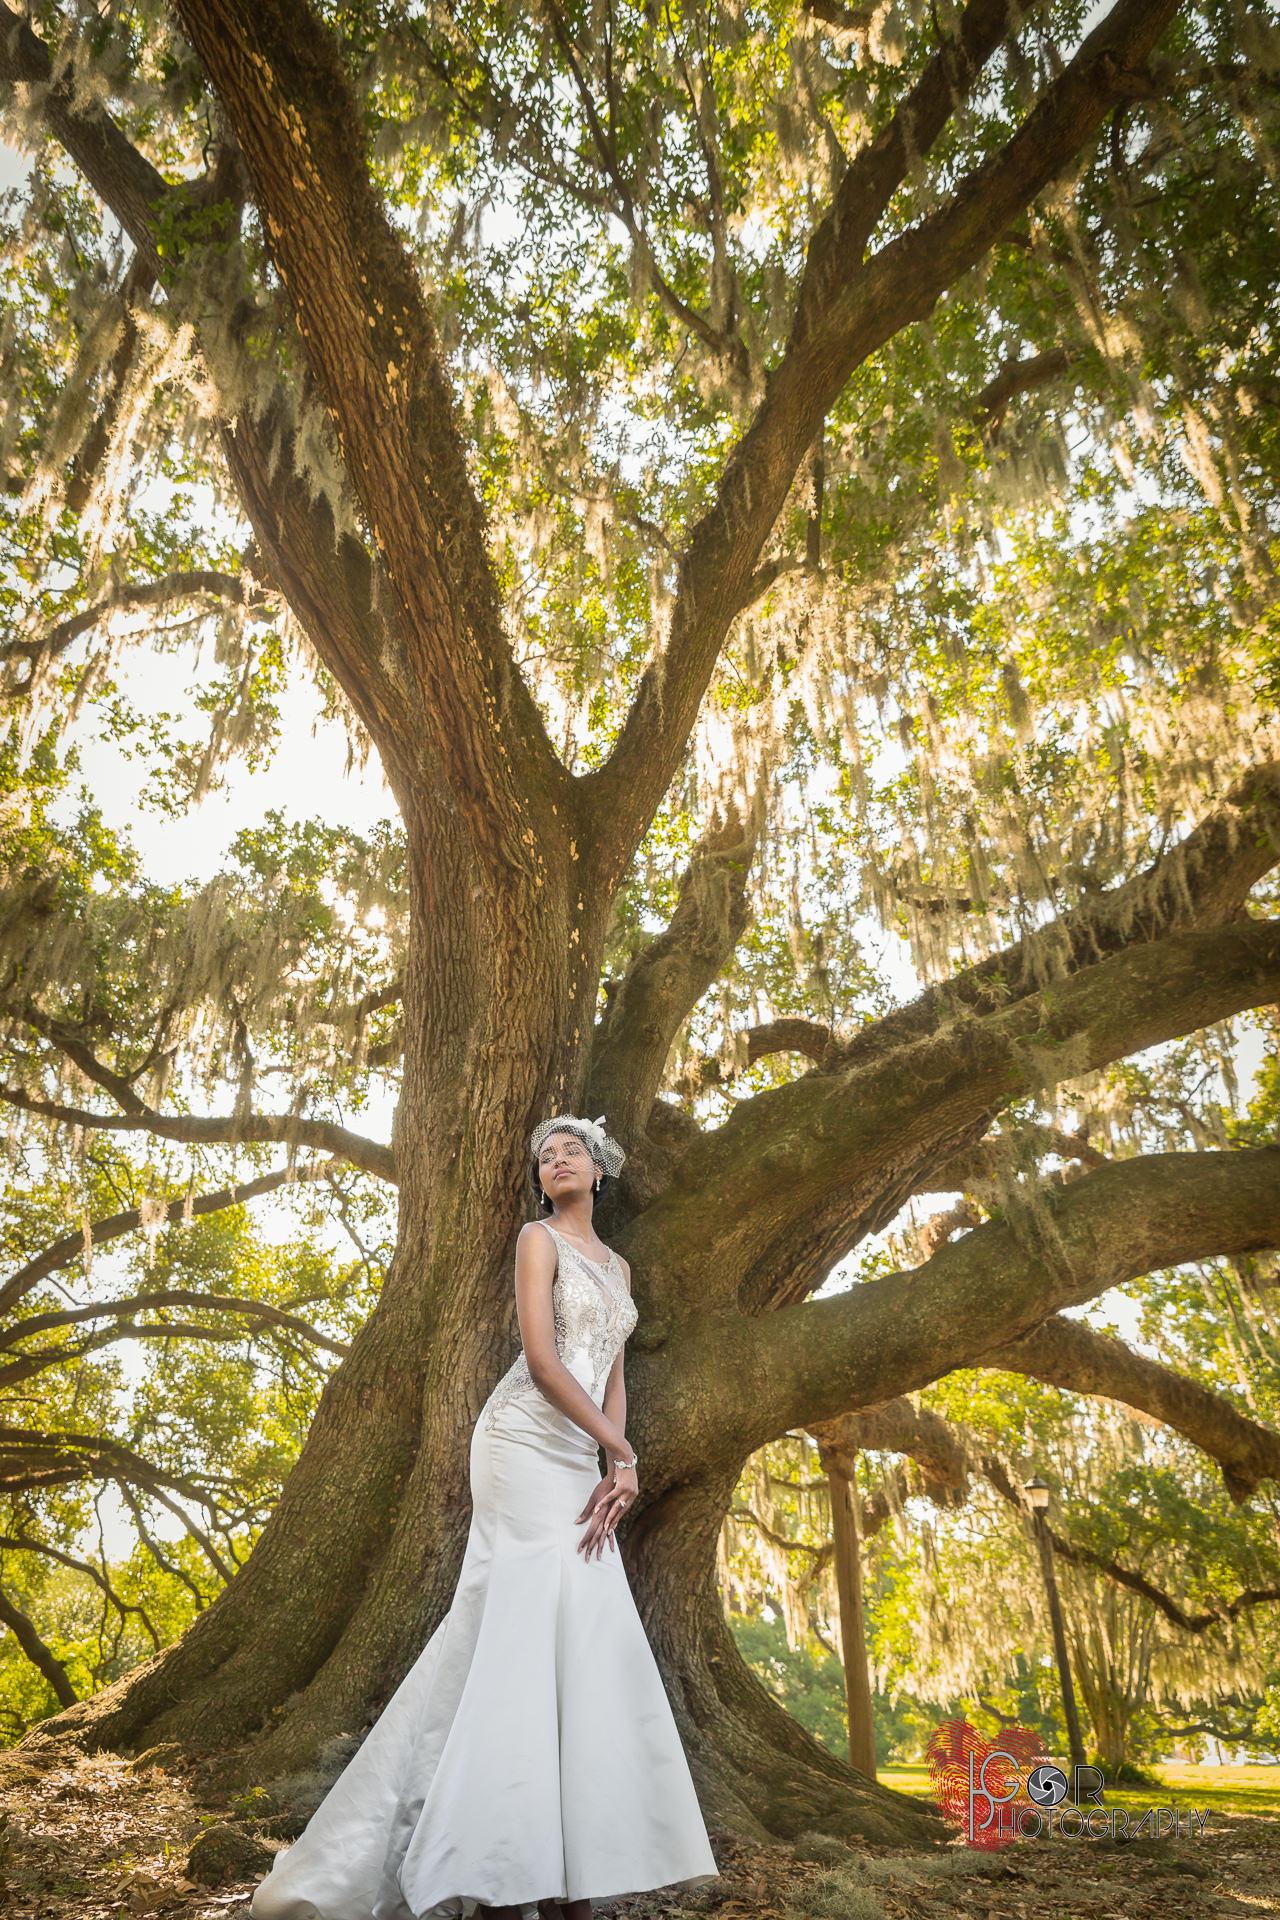 bridal-nola-greer-06837.jpg